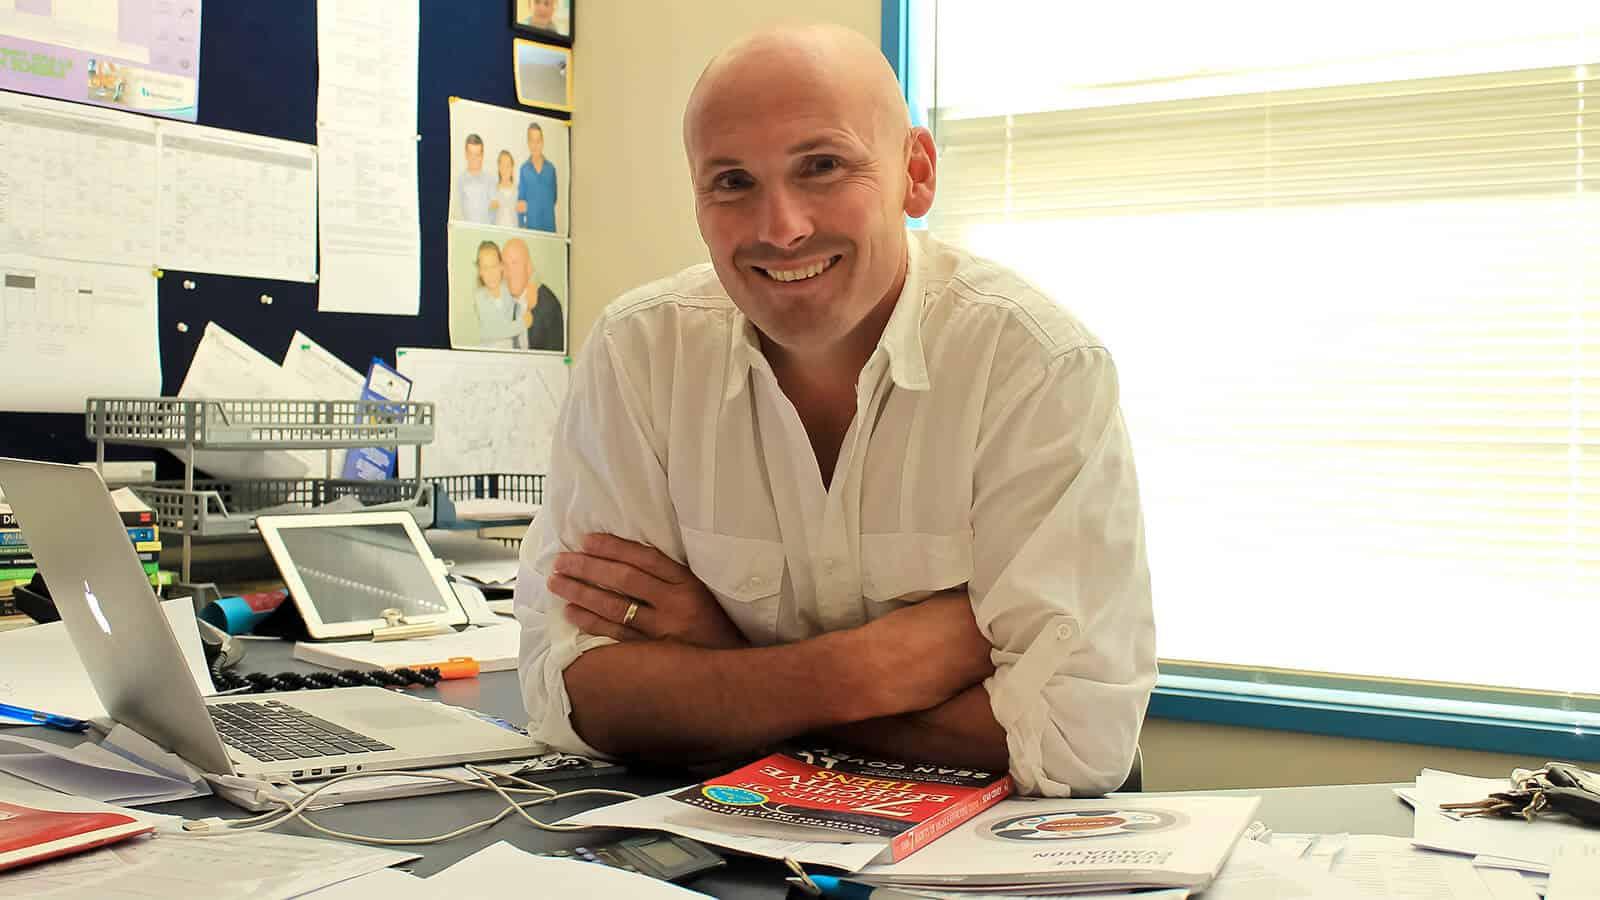 Michael Sisam